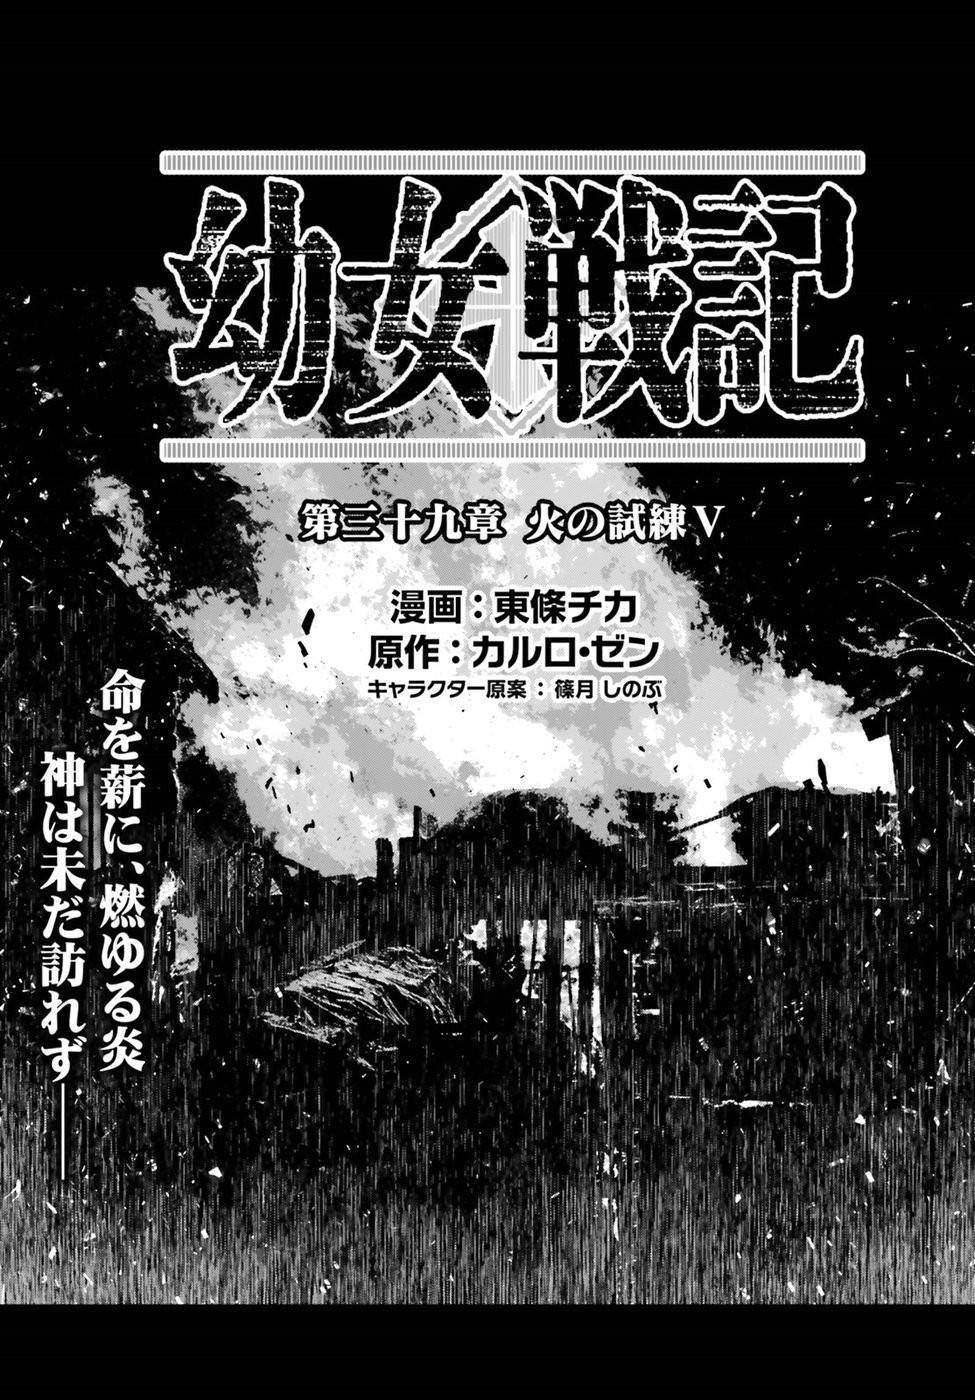 Youjo Senki - Chapter 39 - Page 1